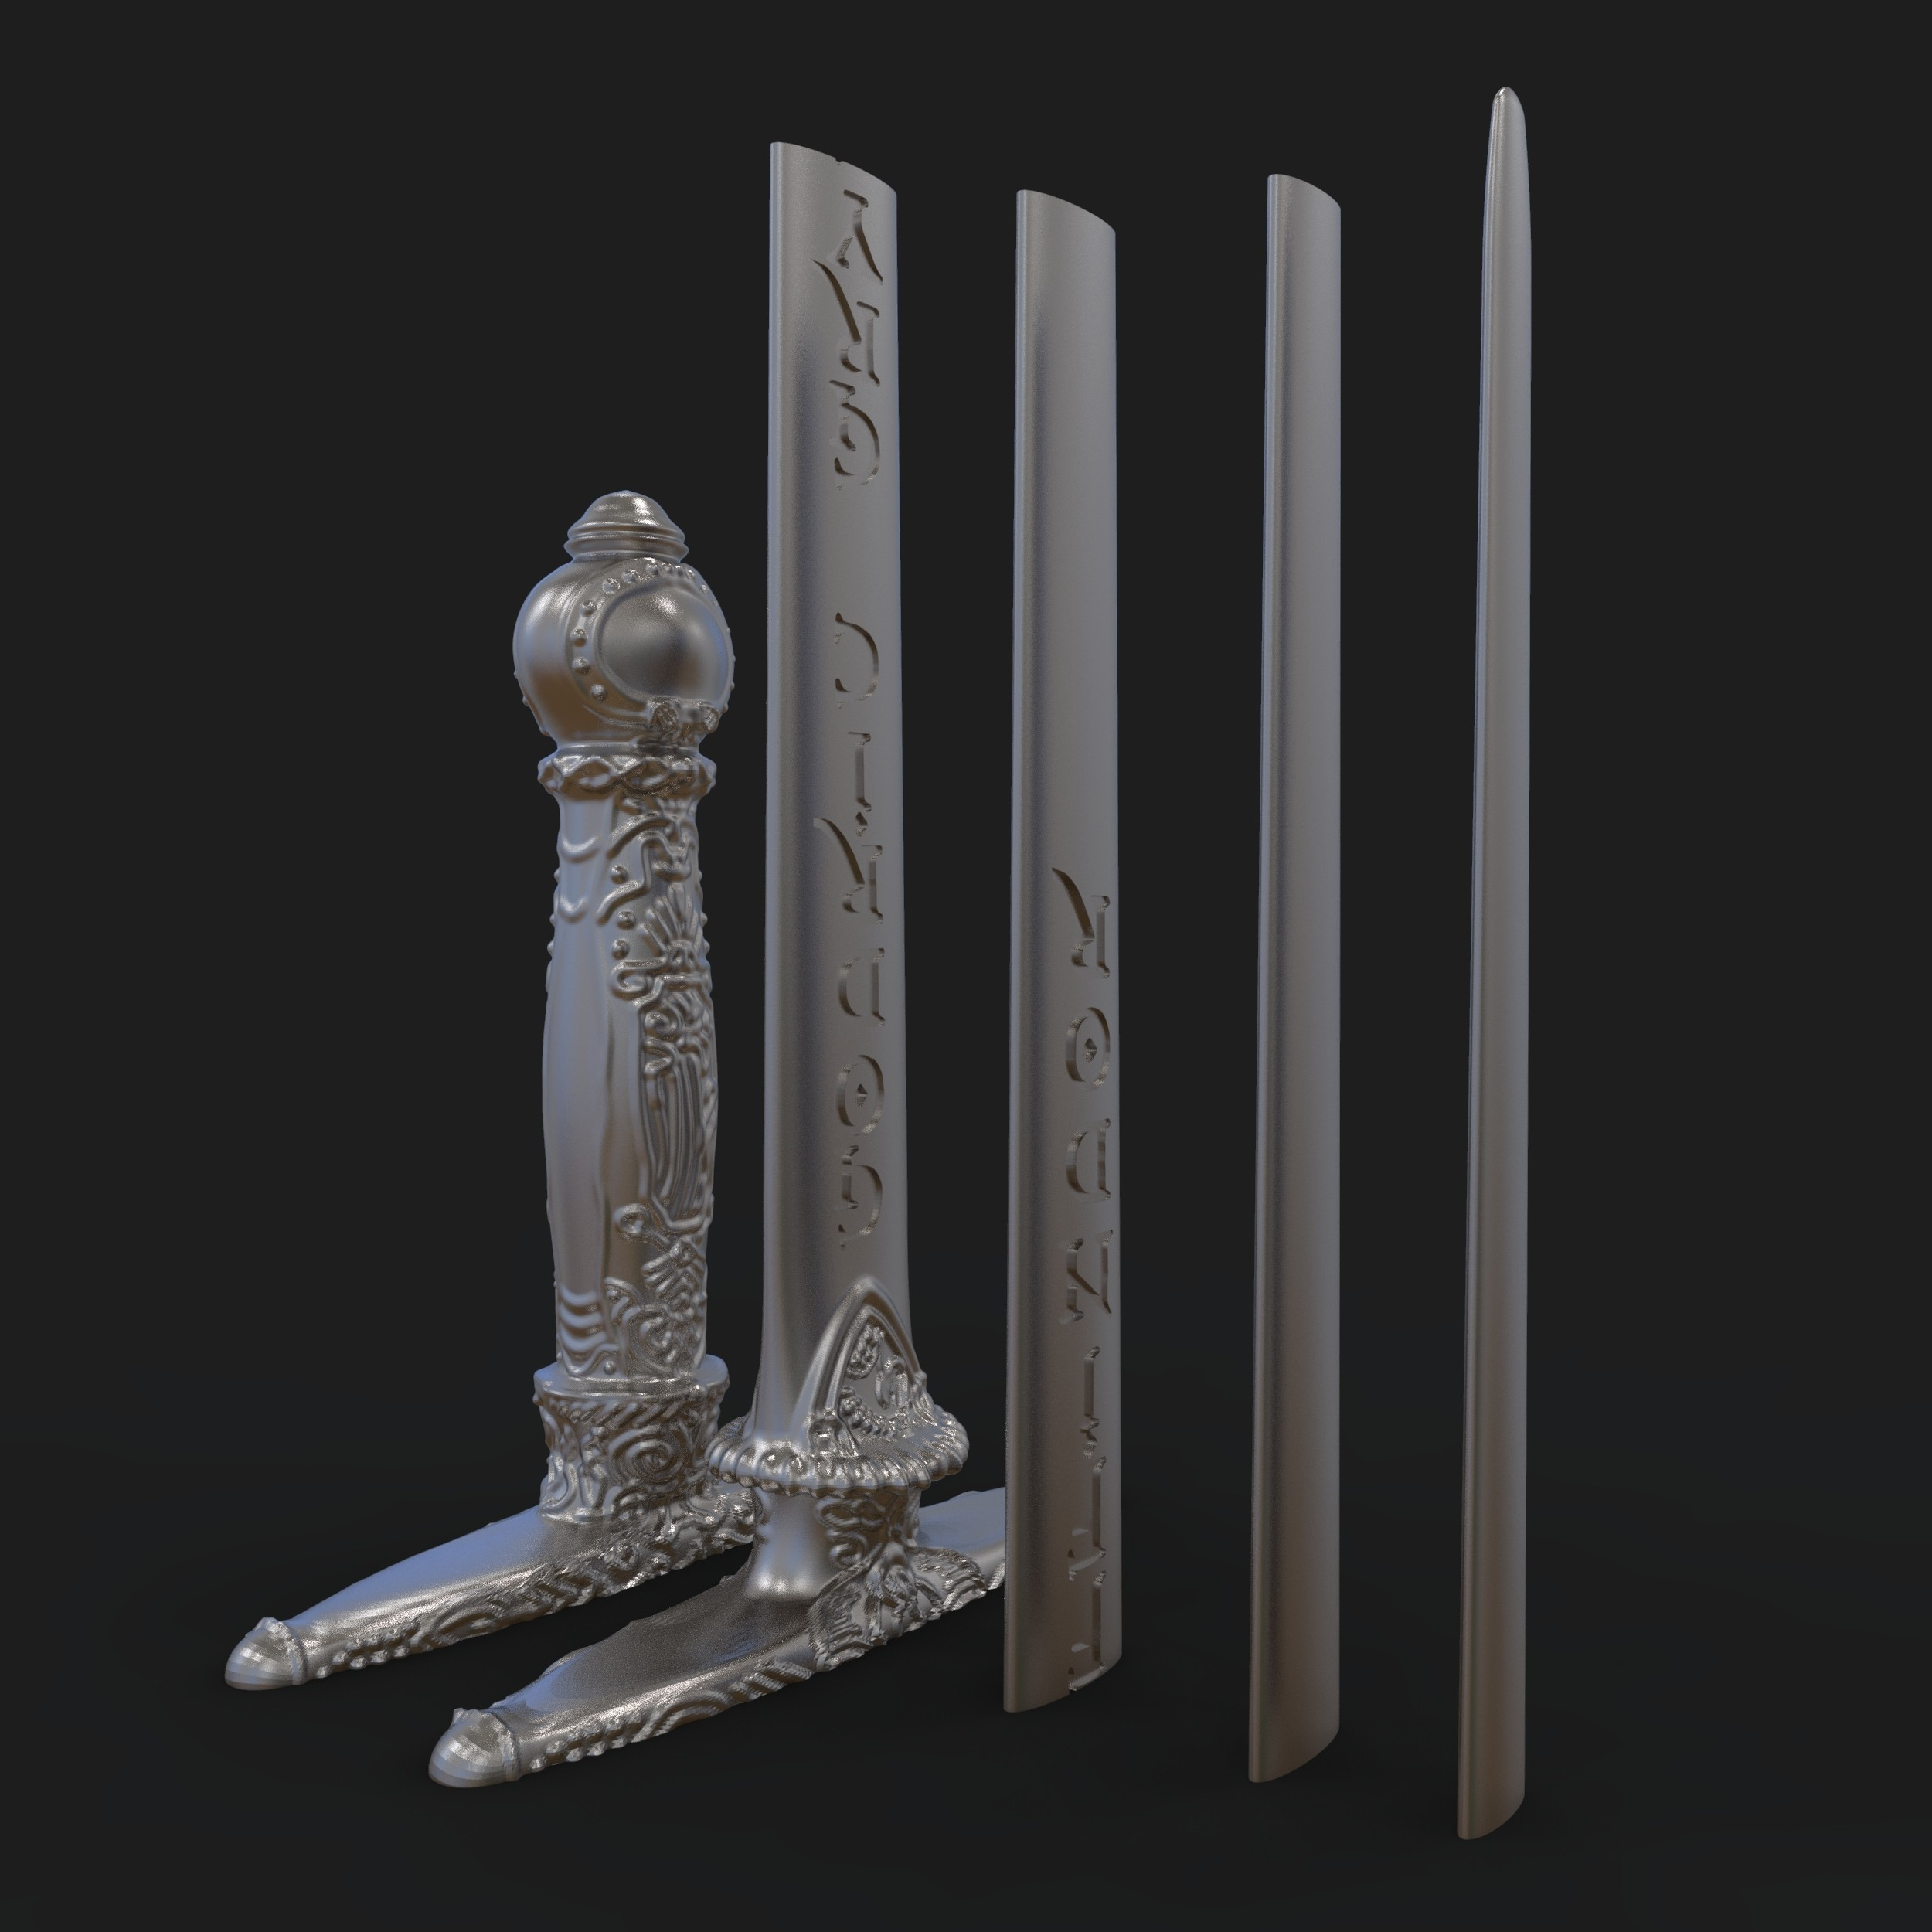 4.jpg Download STL file Godric Gryffindor's Sword - Harry Potter • 3D printing template, tolgaaxu